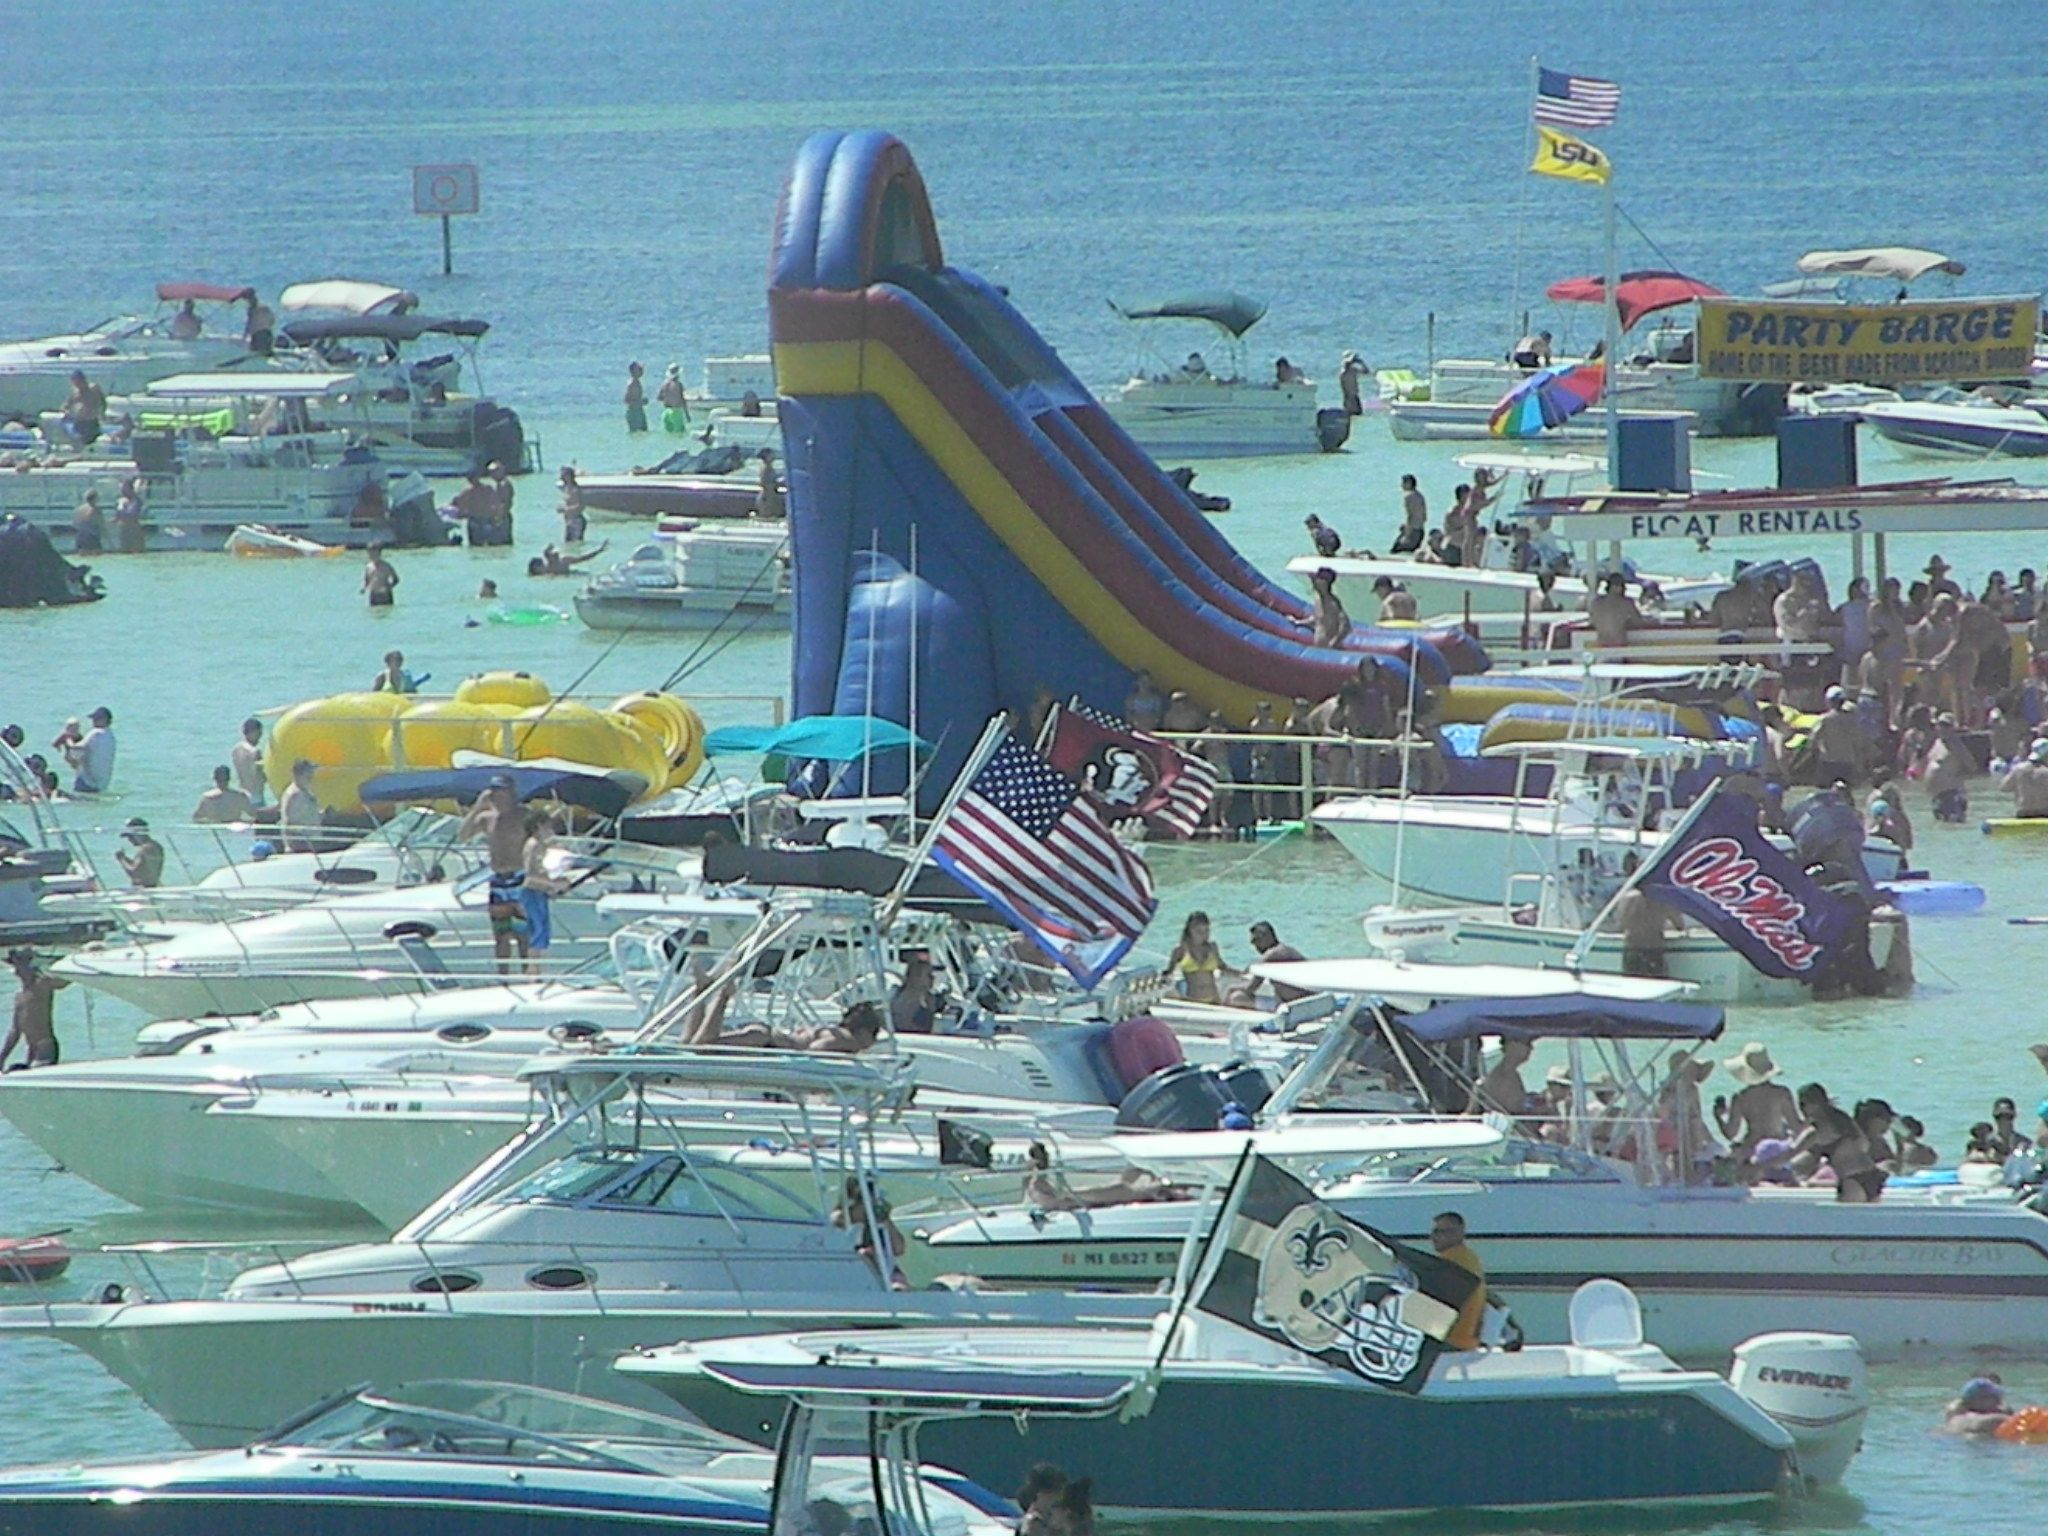 Pin By Nwfbeachlife On Vacation Locations Events Crab Island Destin Fl Destin Florida Beach Destin Florida Vacation